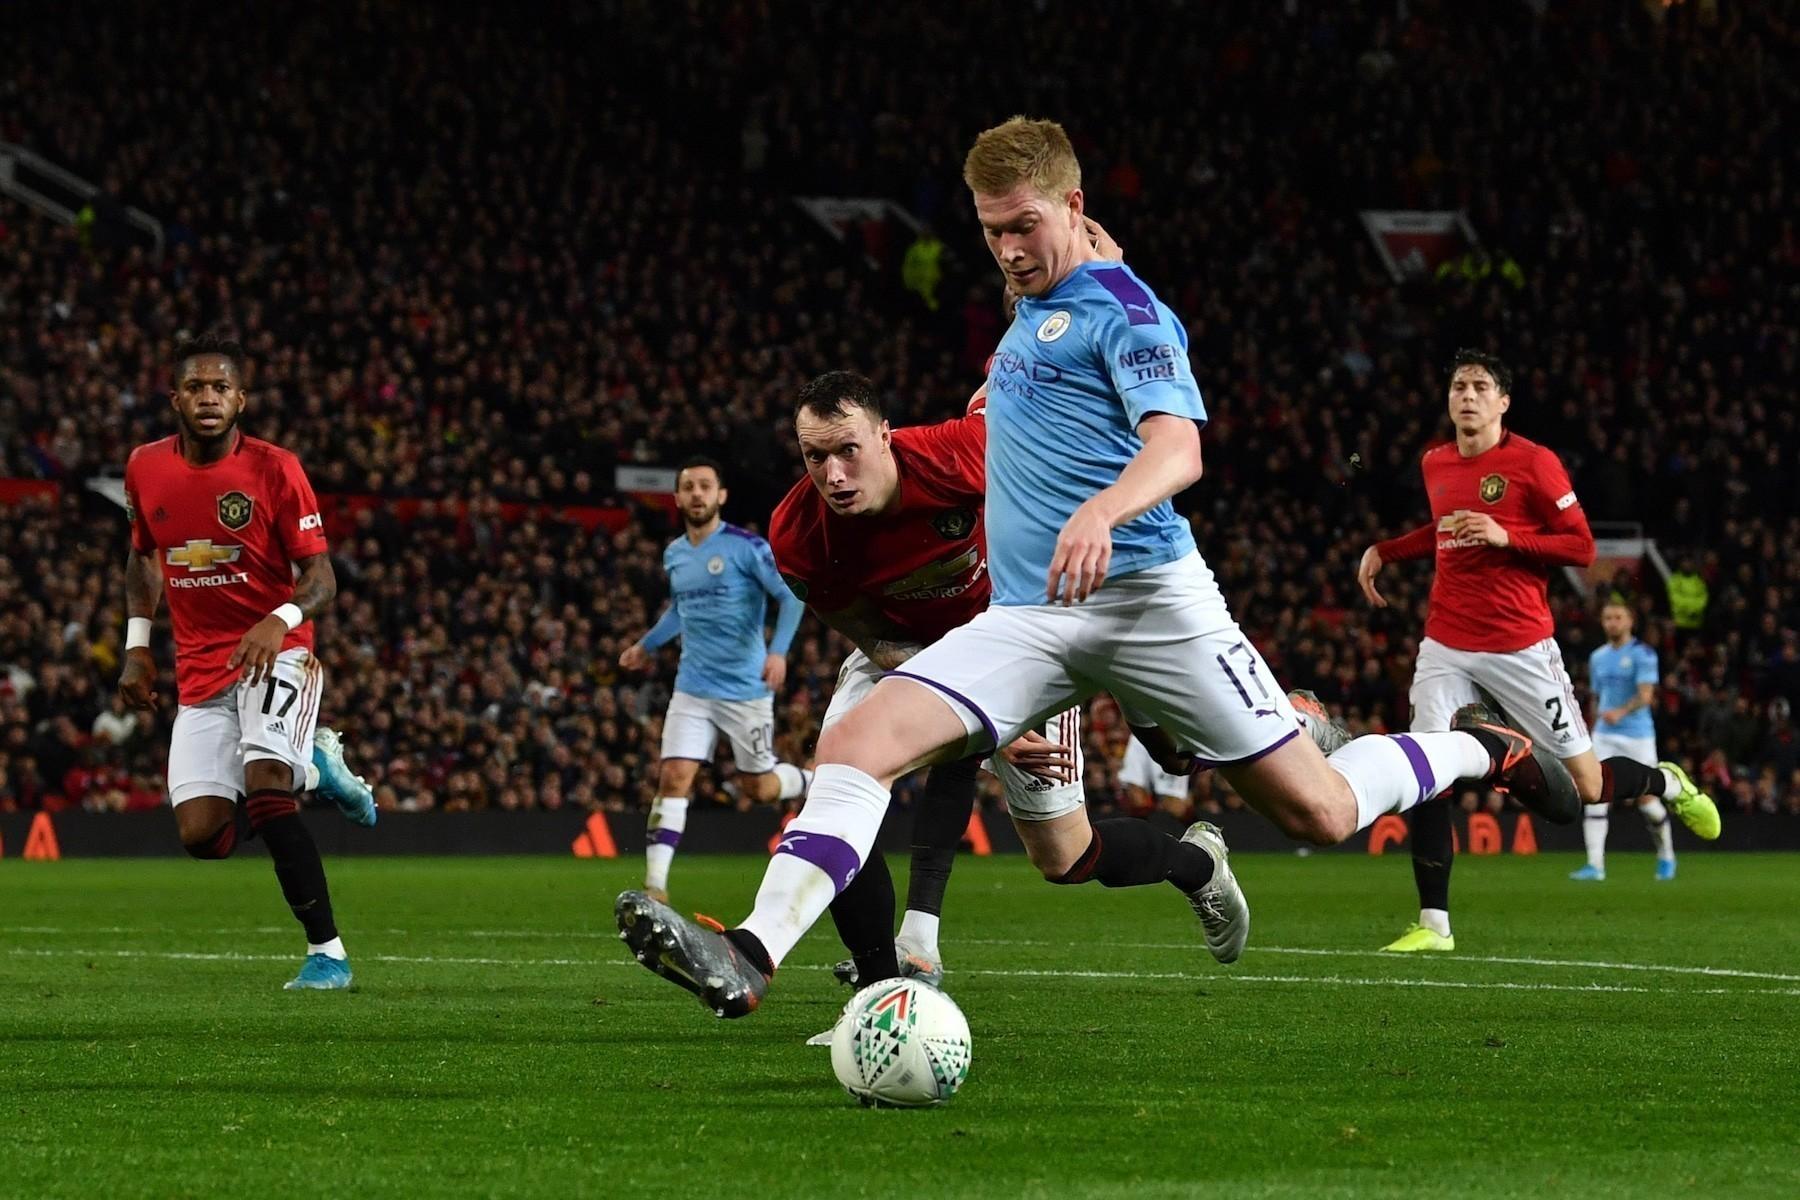 Man Utd vs Man City Prediction: Odds & Betting Tips